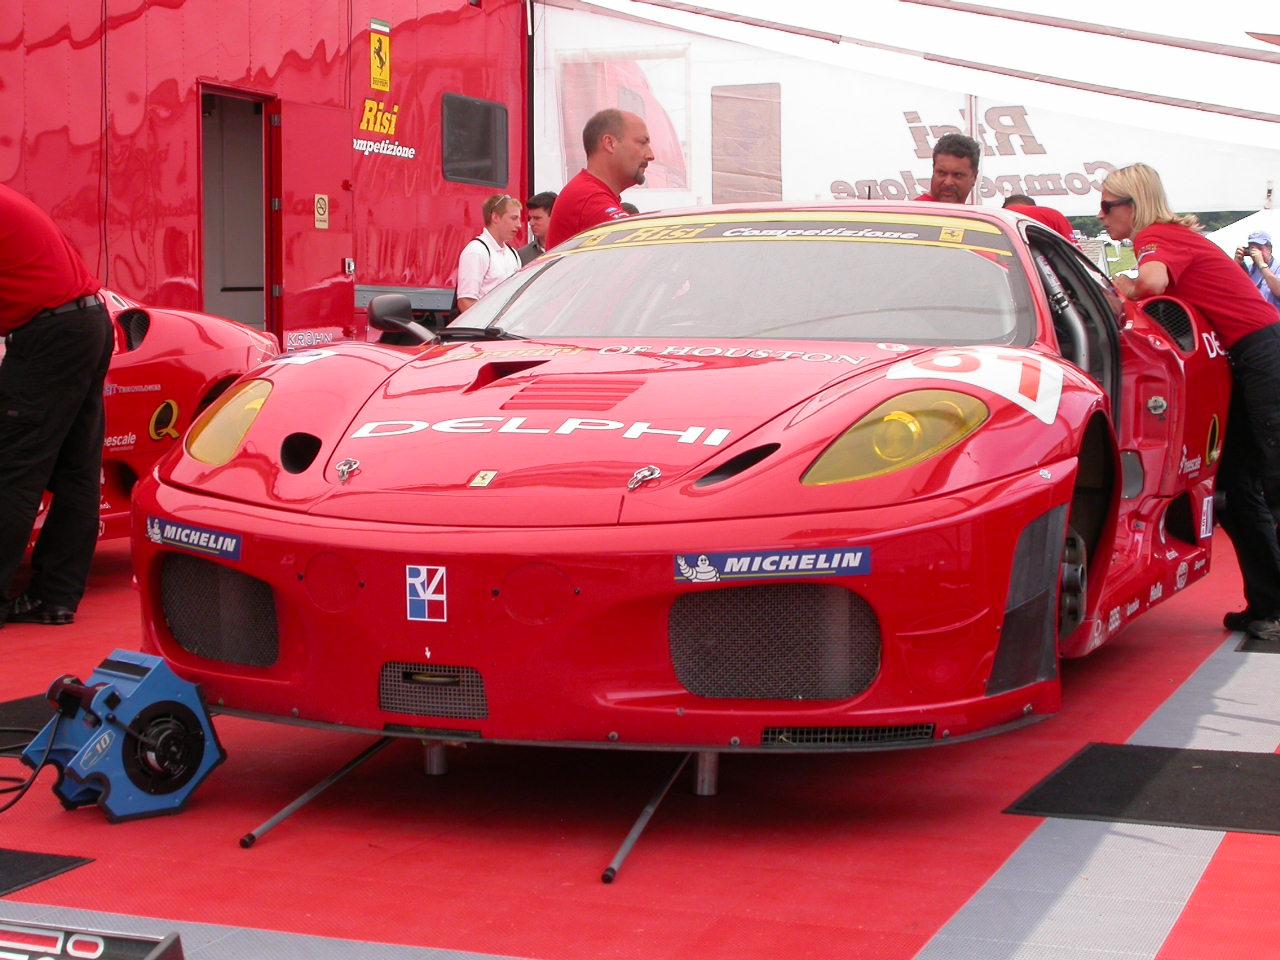 Risi Ferrari Lime Rock Le Mans